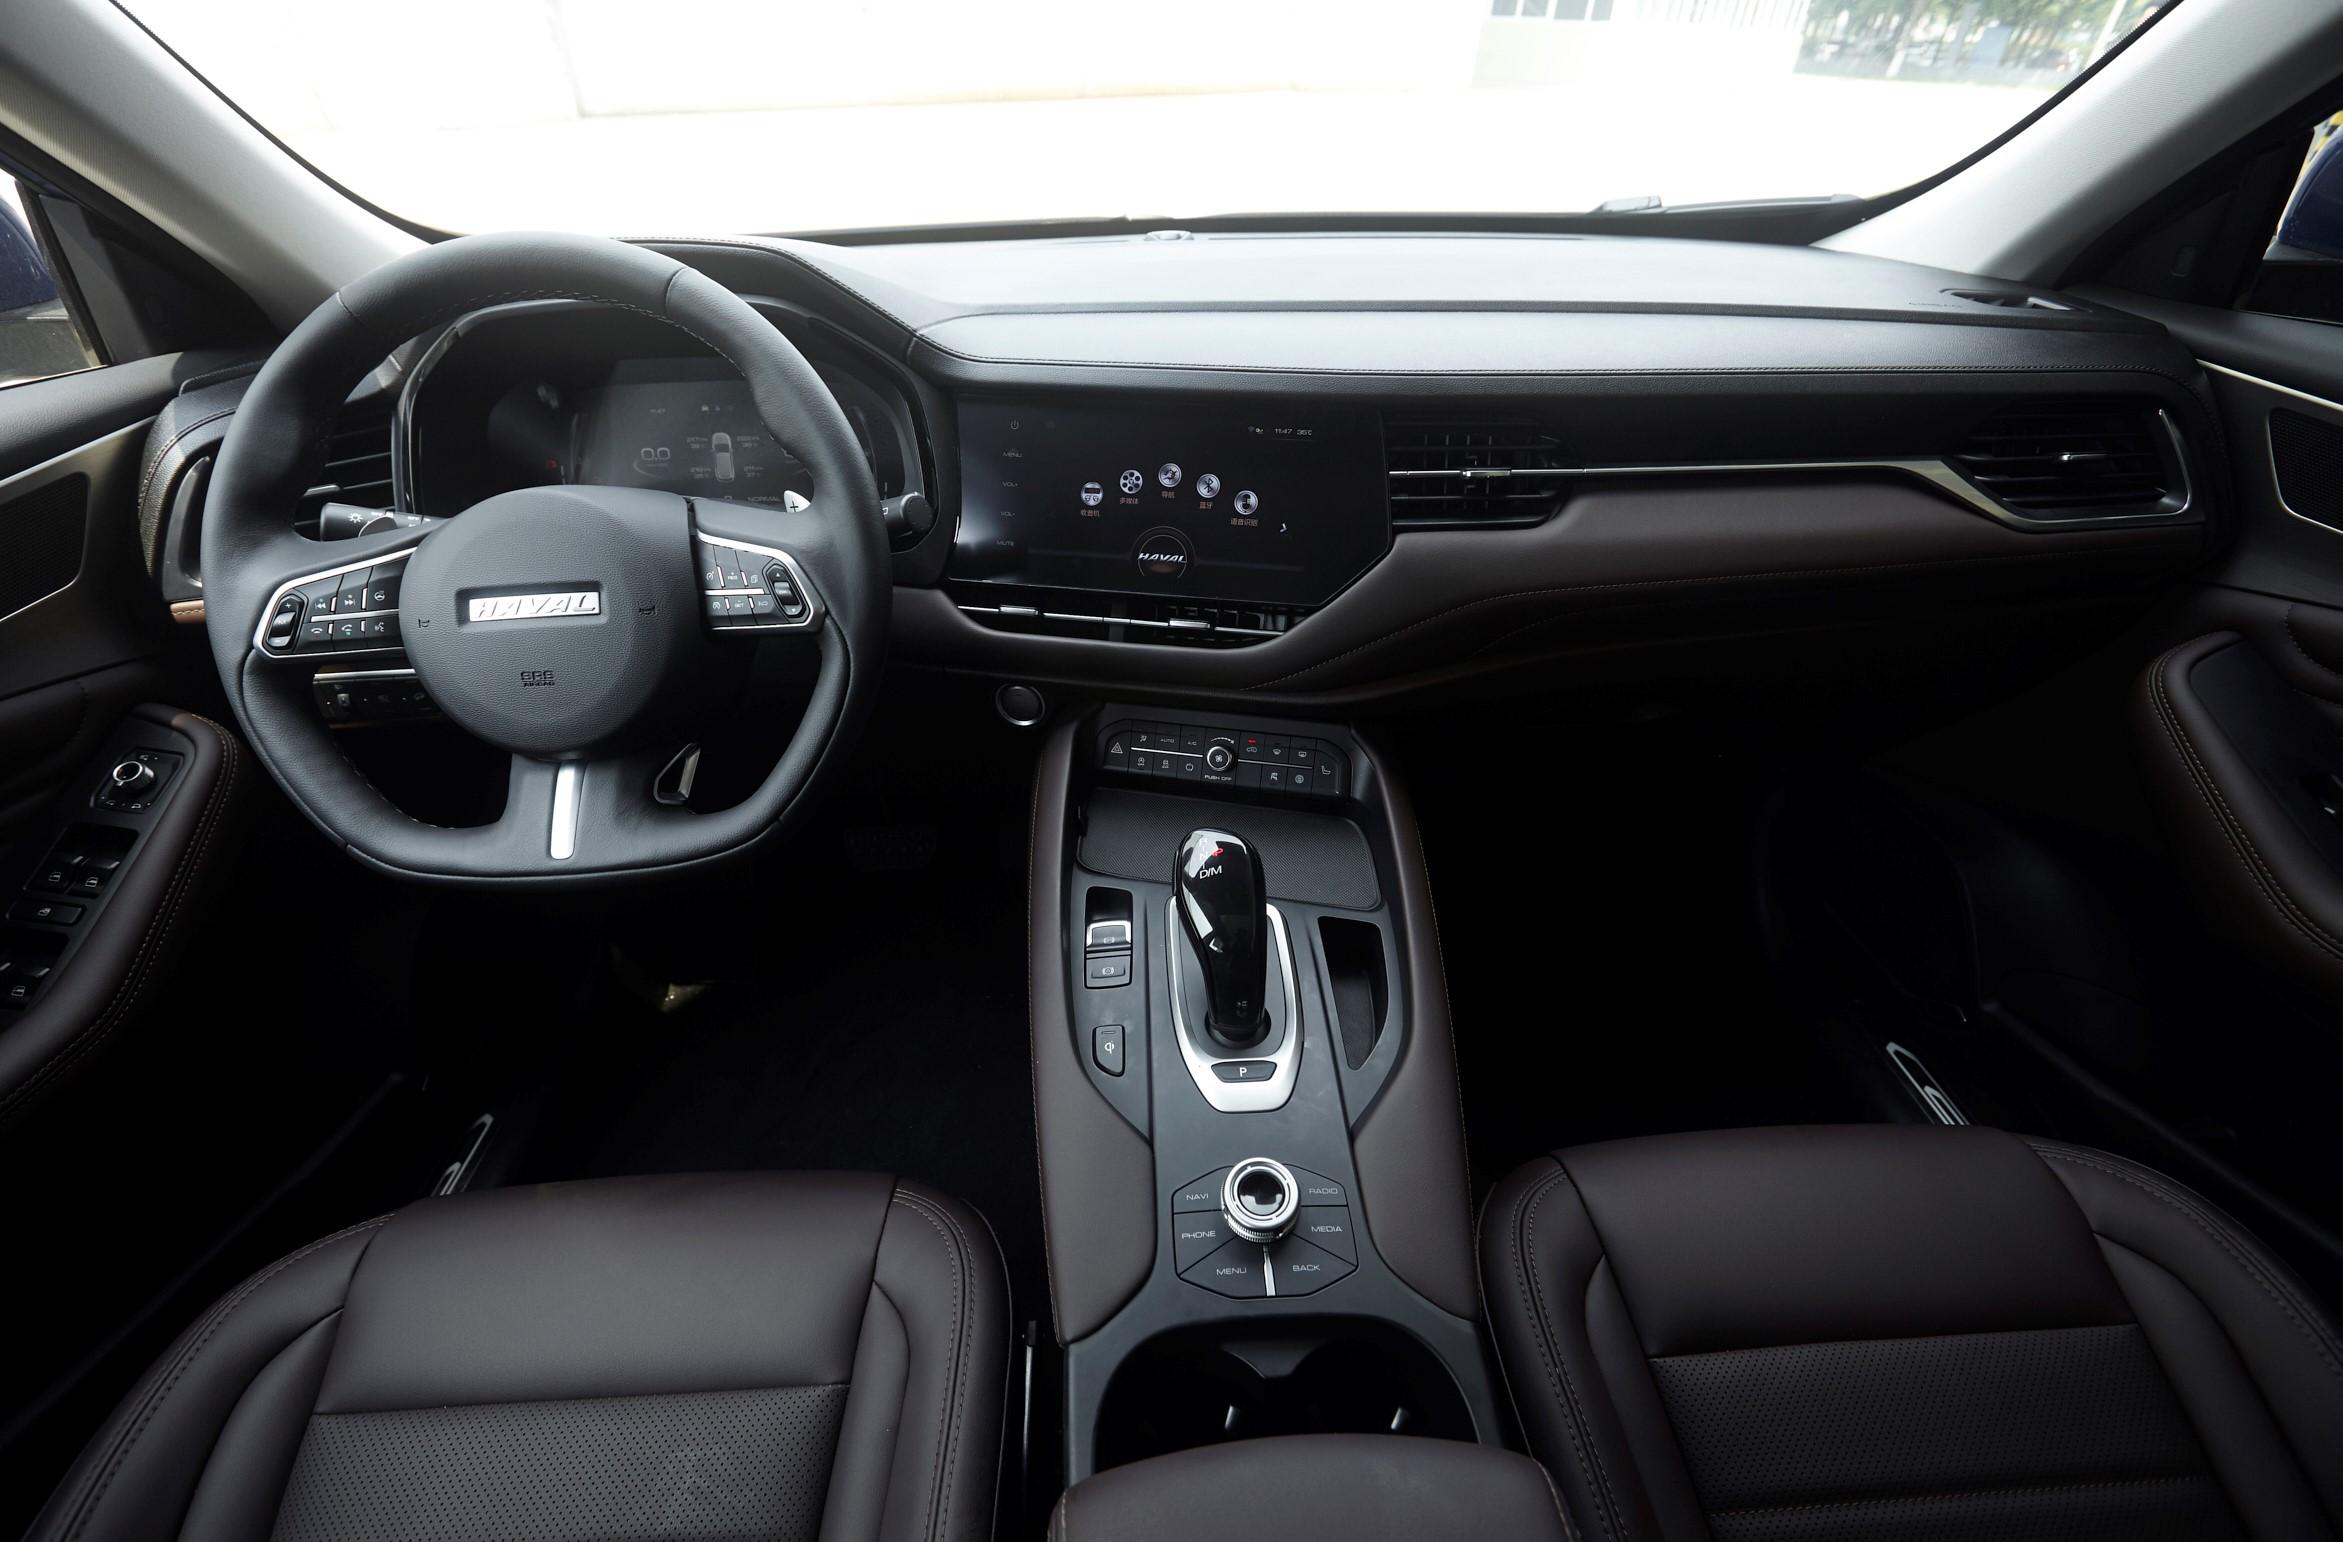 AI智能网联SUV—哈弗F7的品鉴之旅